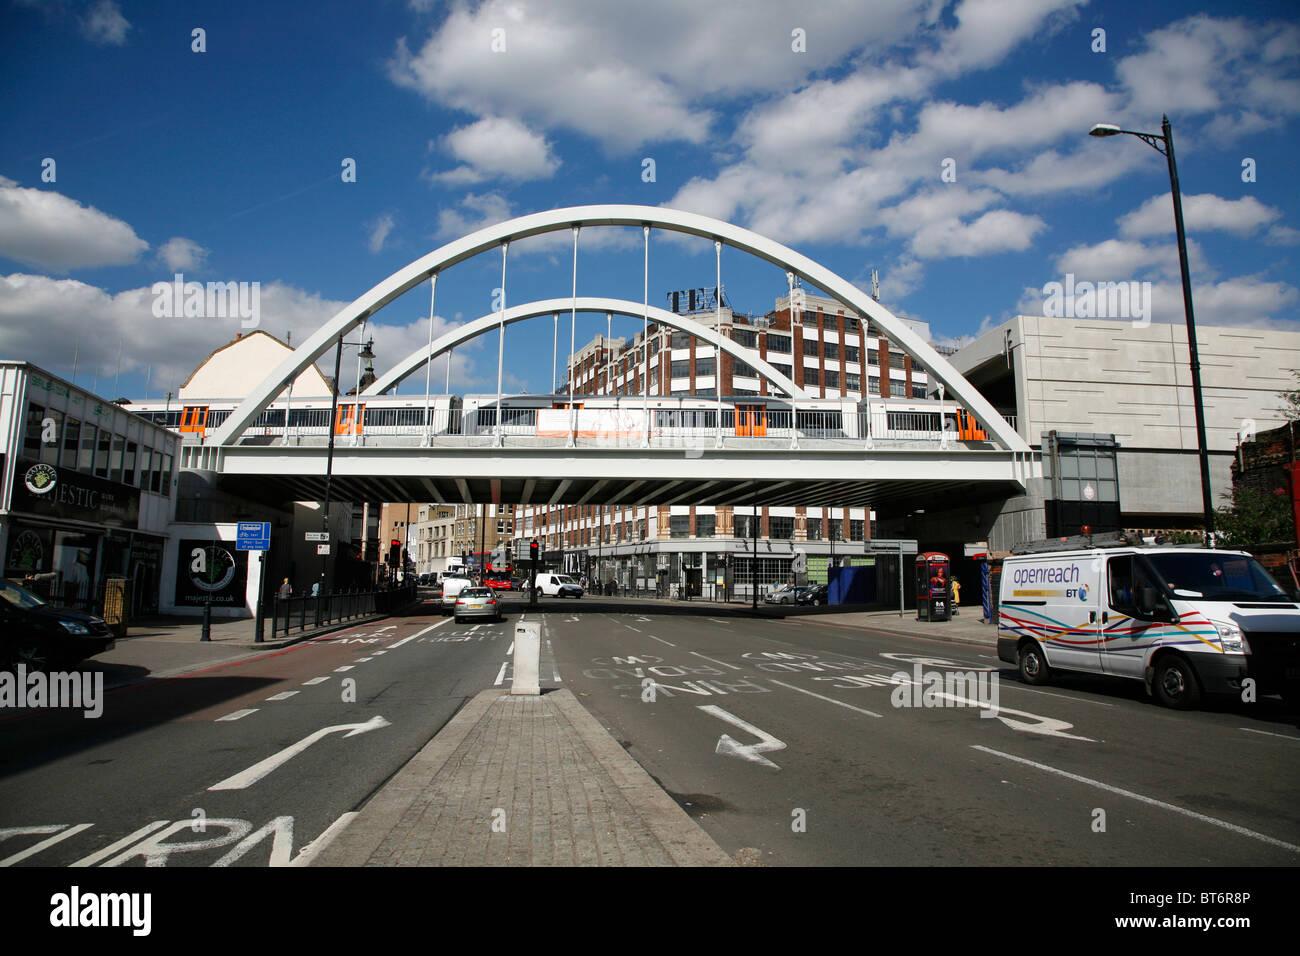 East London line (Overground) train crossing Shoreditch High Street, Shoreditch, London, UK - Stock Image